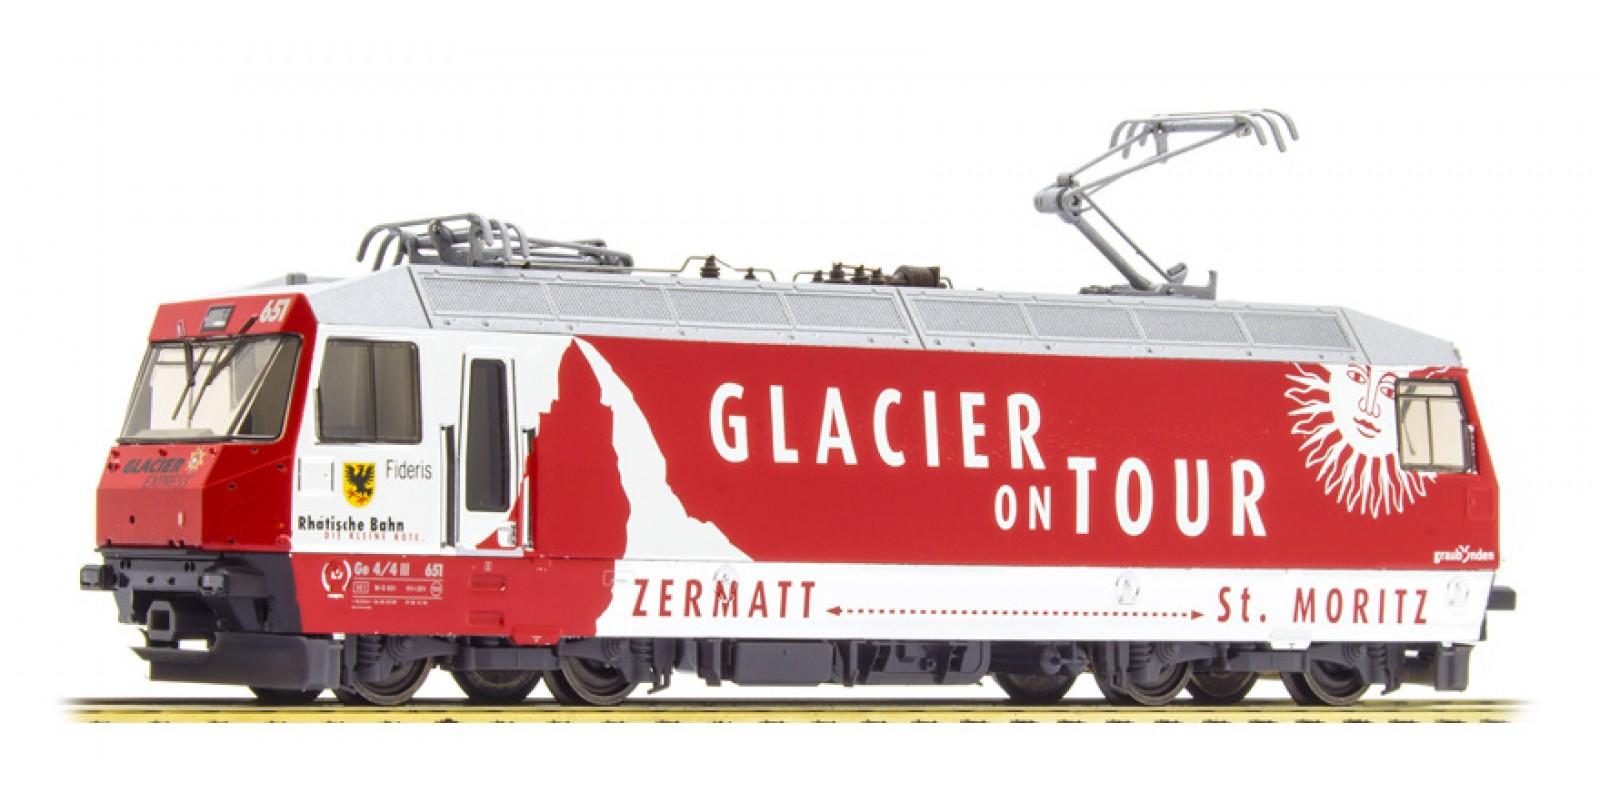 BM1559161 RhB Ge 4/4 III 651 'Glacier on Tour' H0 Normalspur 3L-WS digital